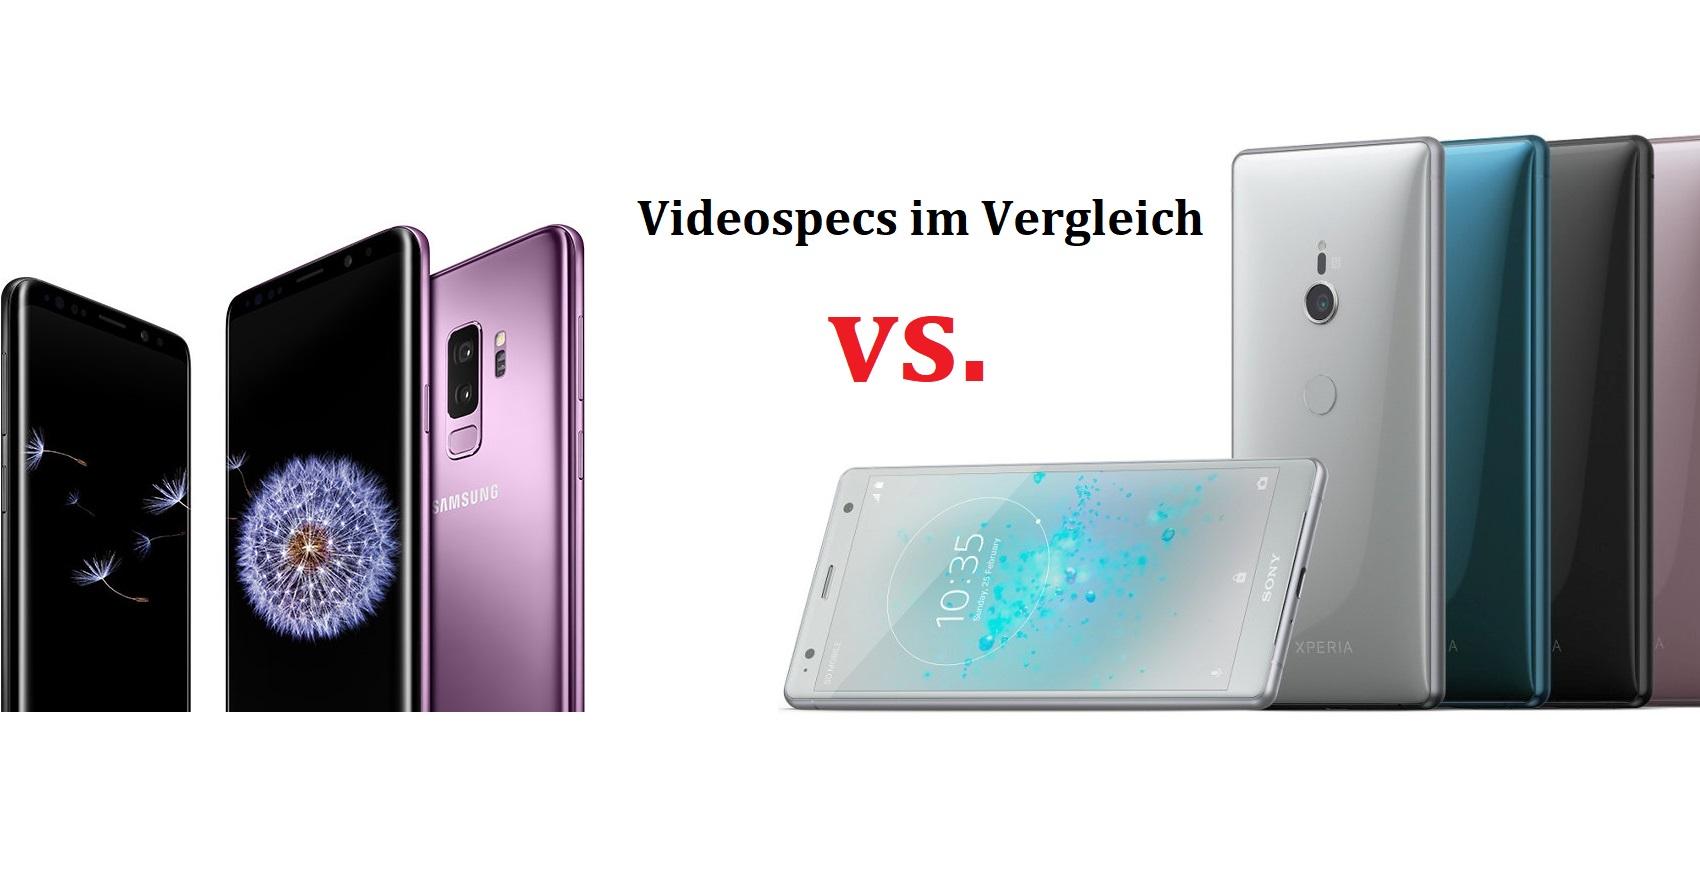 Samsung S9 Vs Sony Xz2